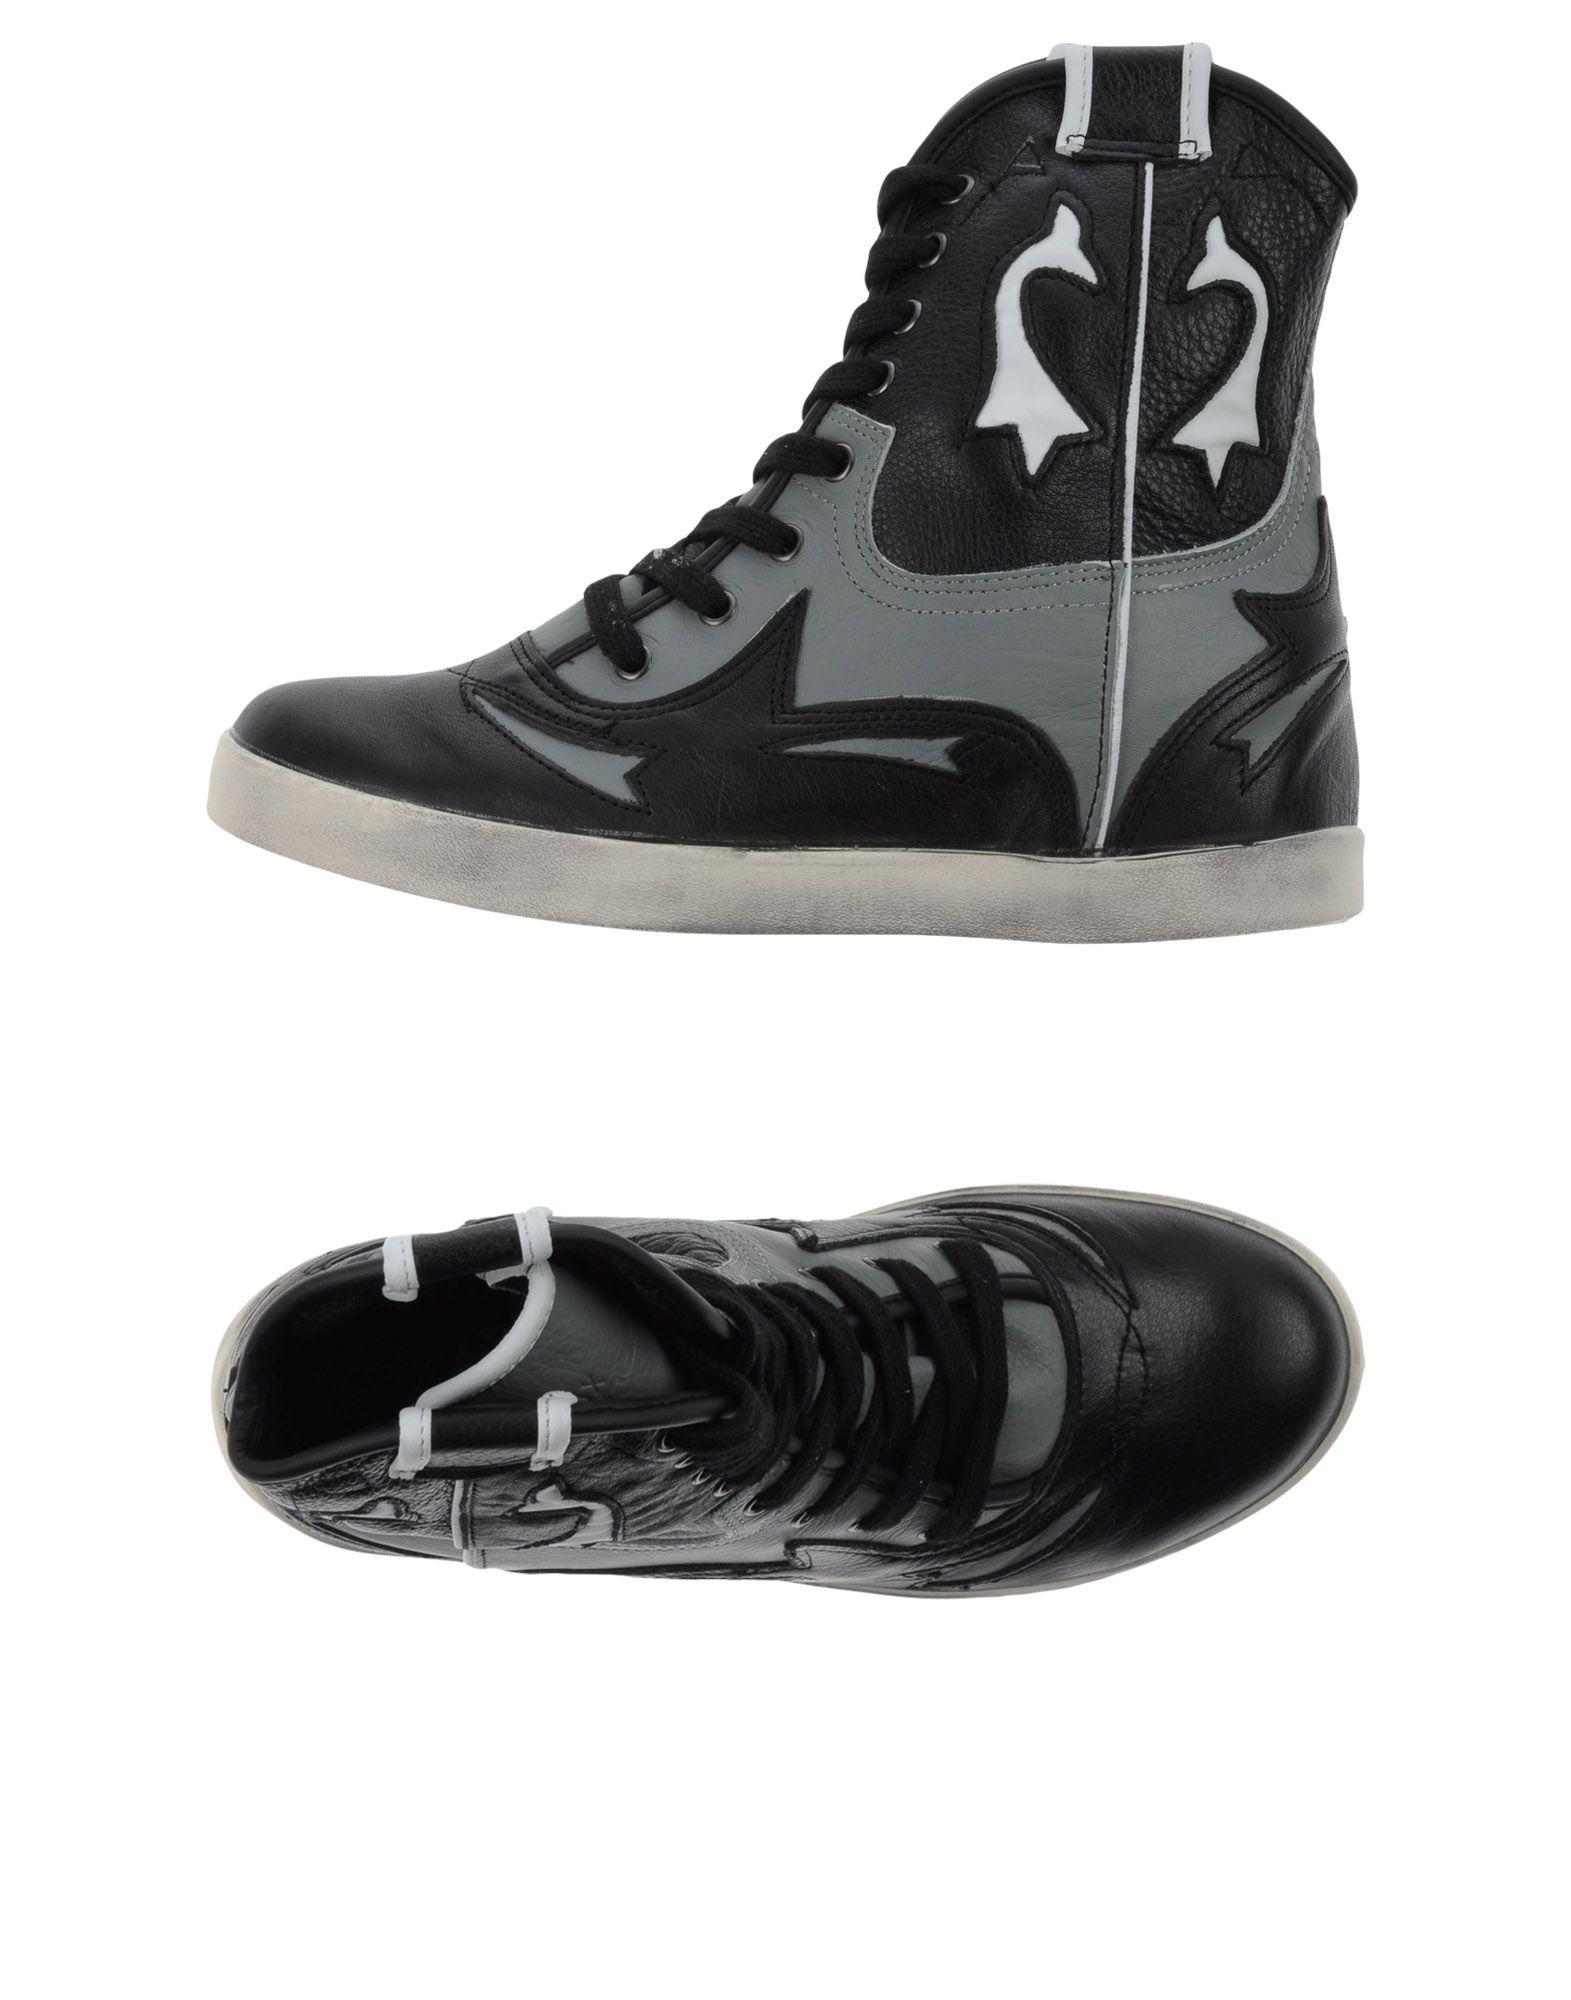 Sneakers Fornarina Sportglam Femme - Sneakers Fornarina Sportglam sur